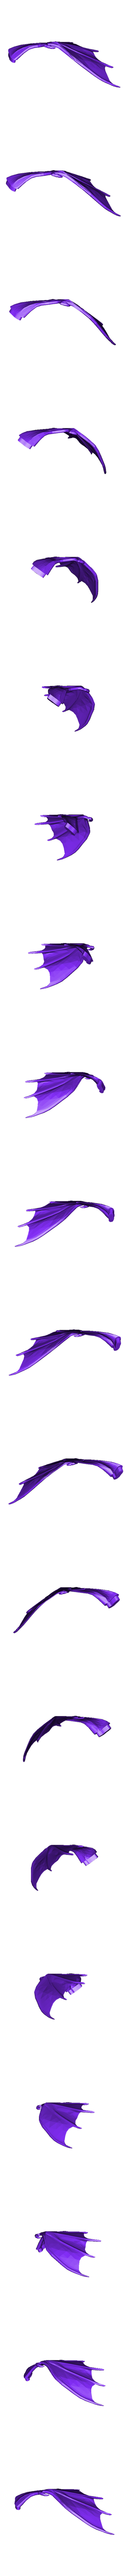 Red_Dragon_Updated_Left_Wing.stl Télécharger fichier STL gratuit Dragon • Plan à imprimer en 3D, JEJE817